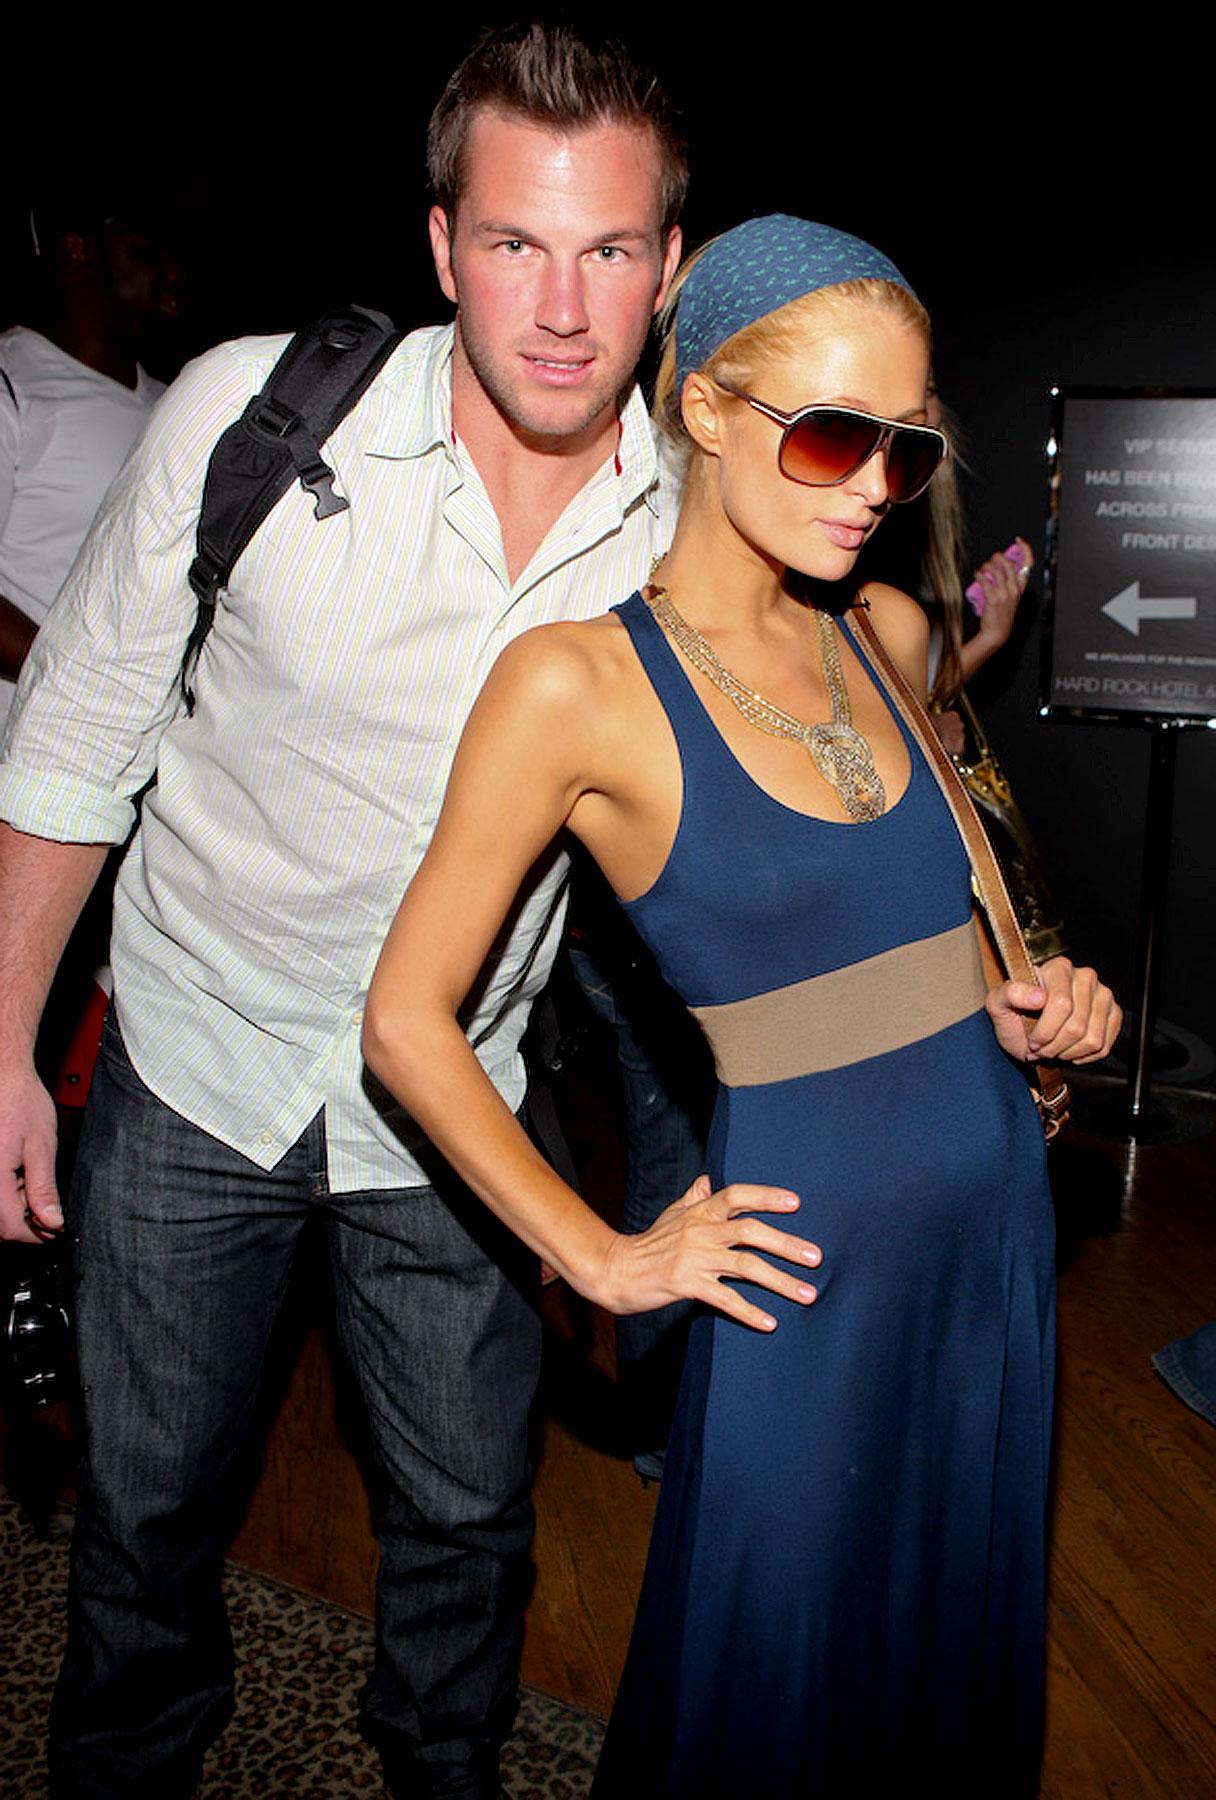 Paris Hilton and Doug Reinhardt arrive at The Hard Rock Hotel in Vegas